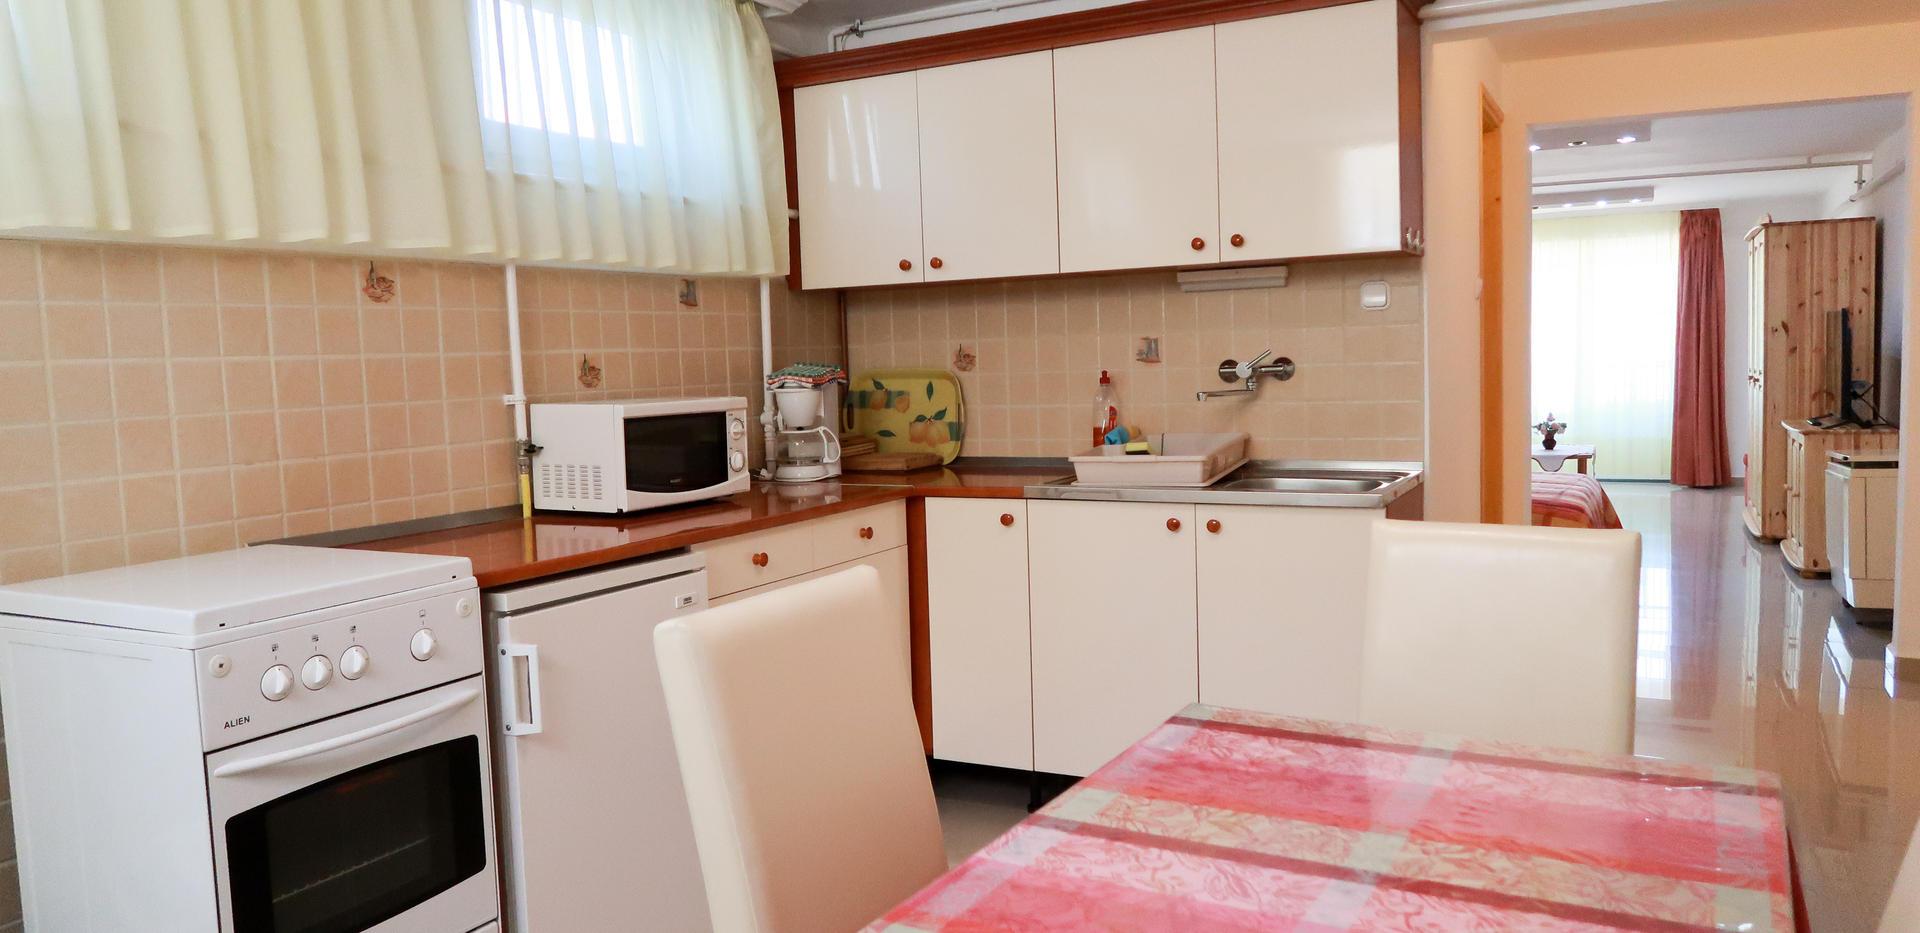 Zalakaros_4-es Ház_1-es apartman